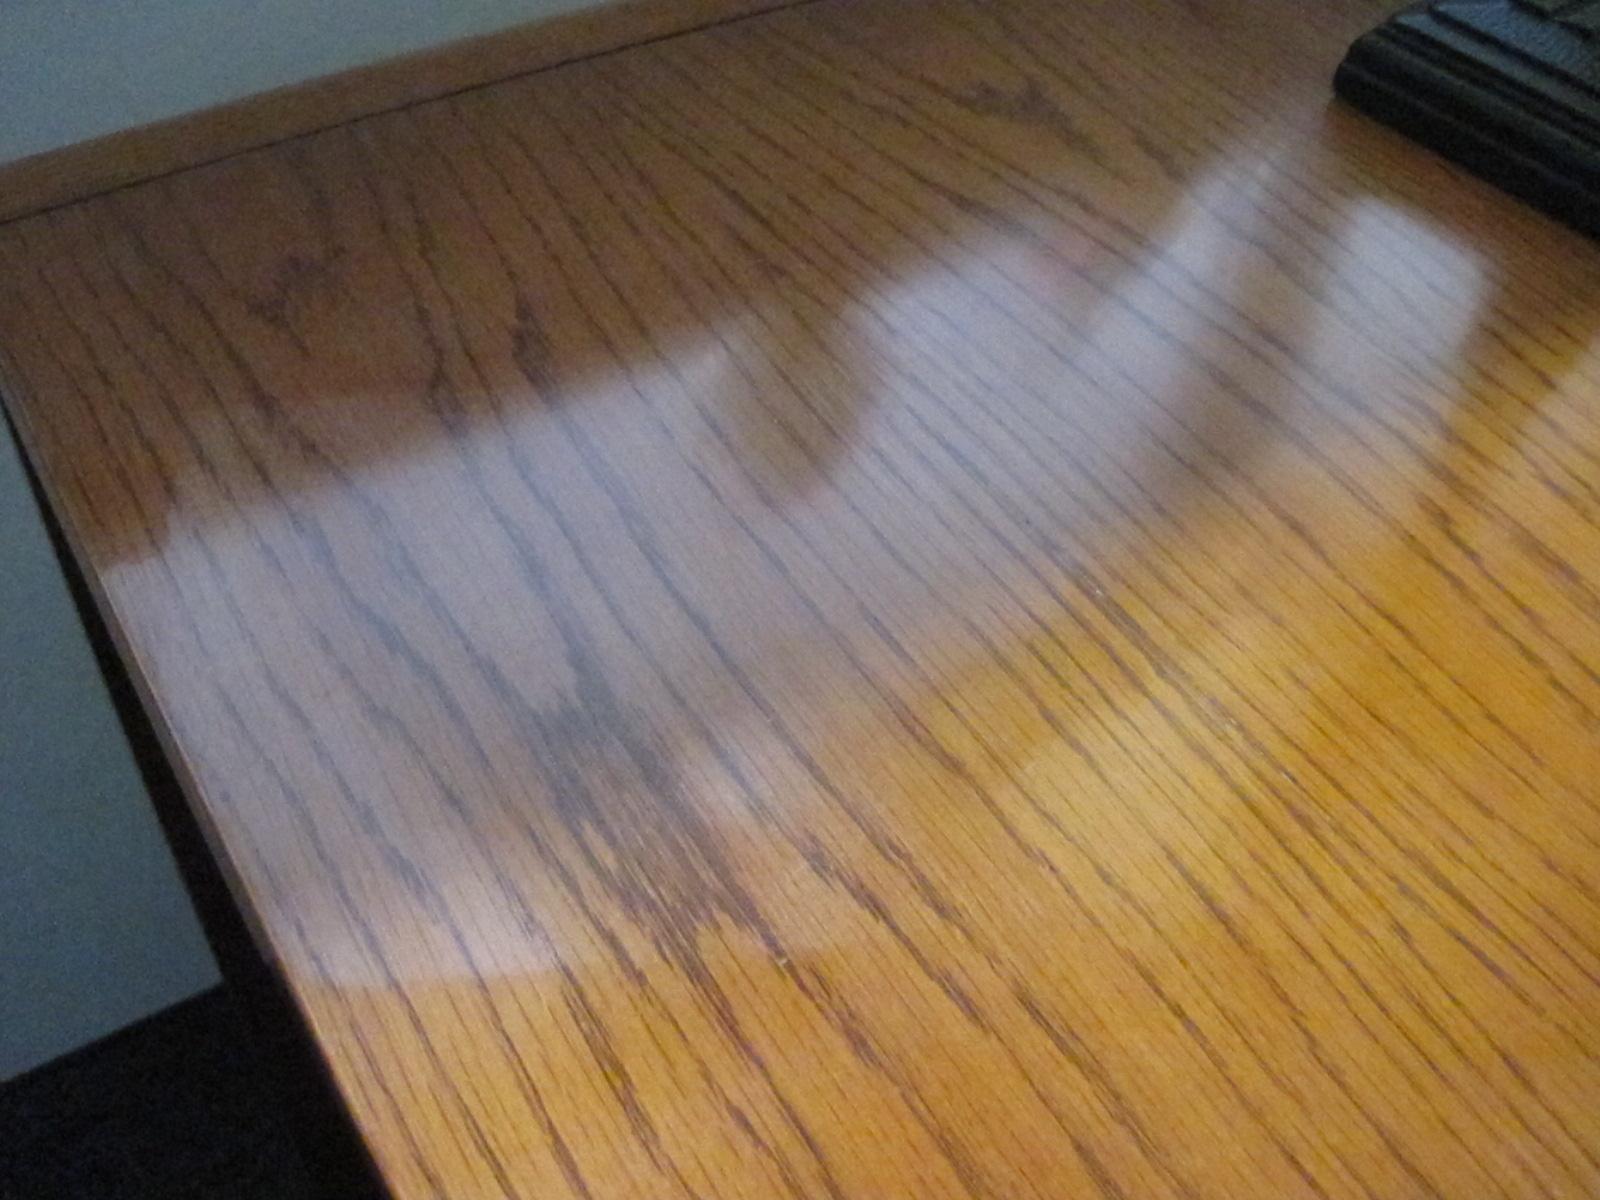 Table repair and refinishing in Buchanan Michigan